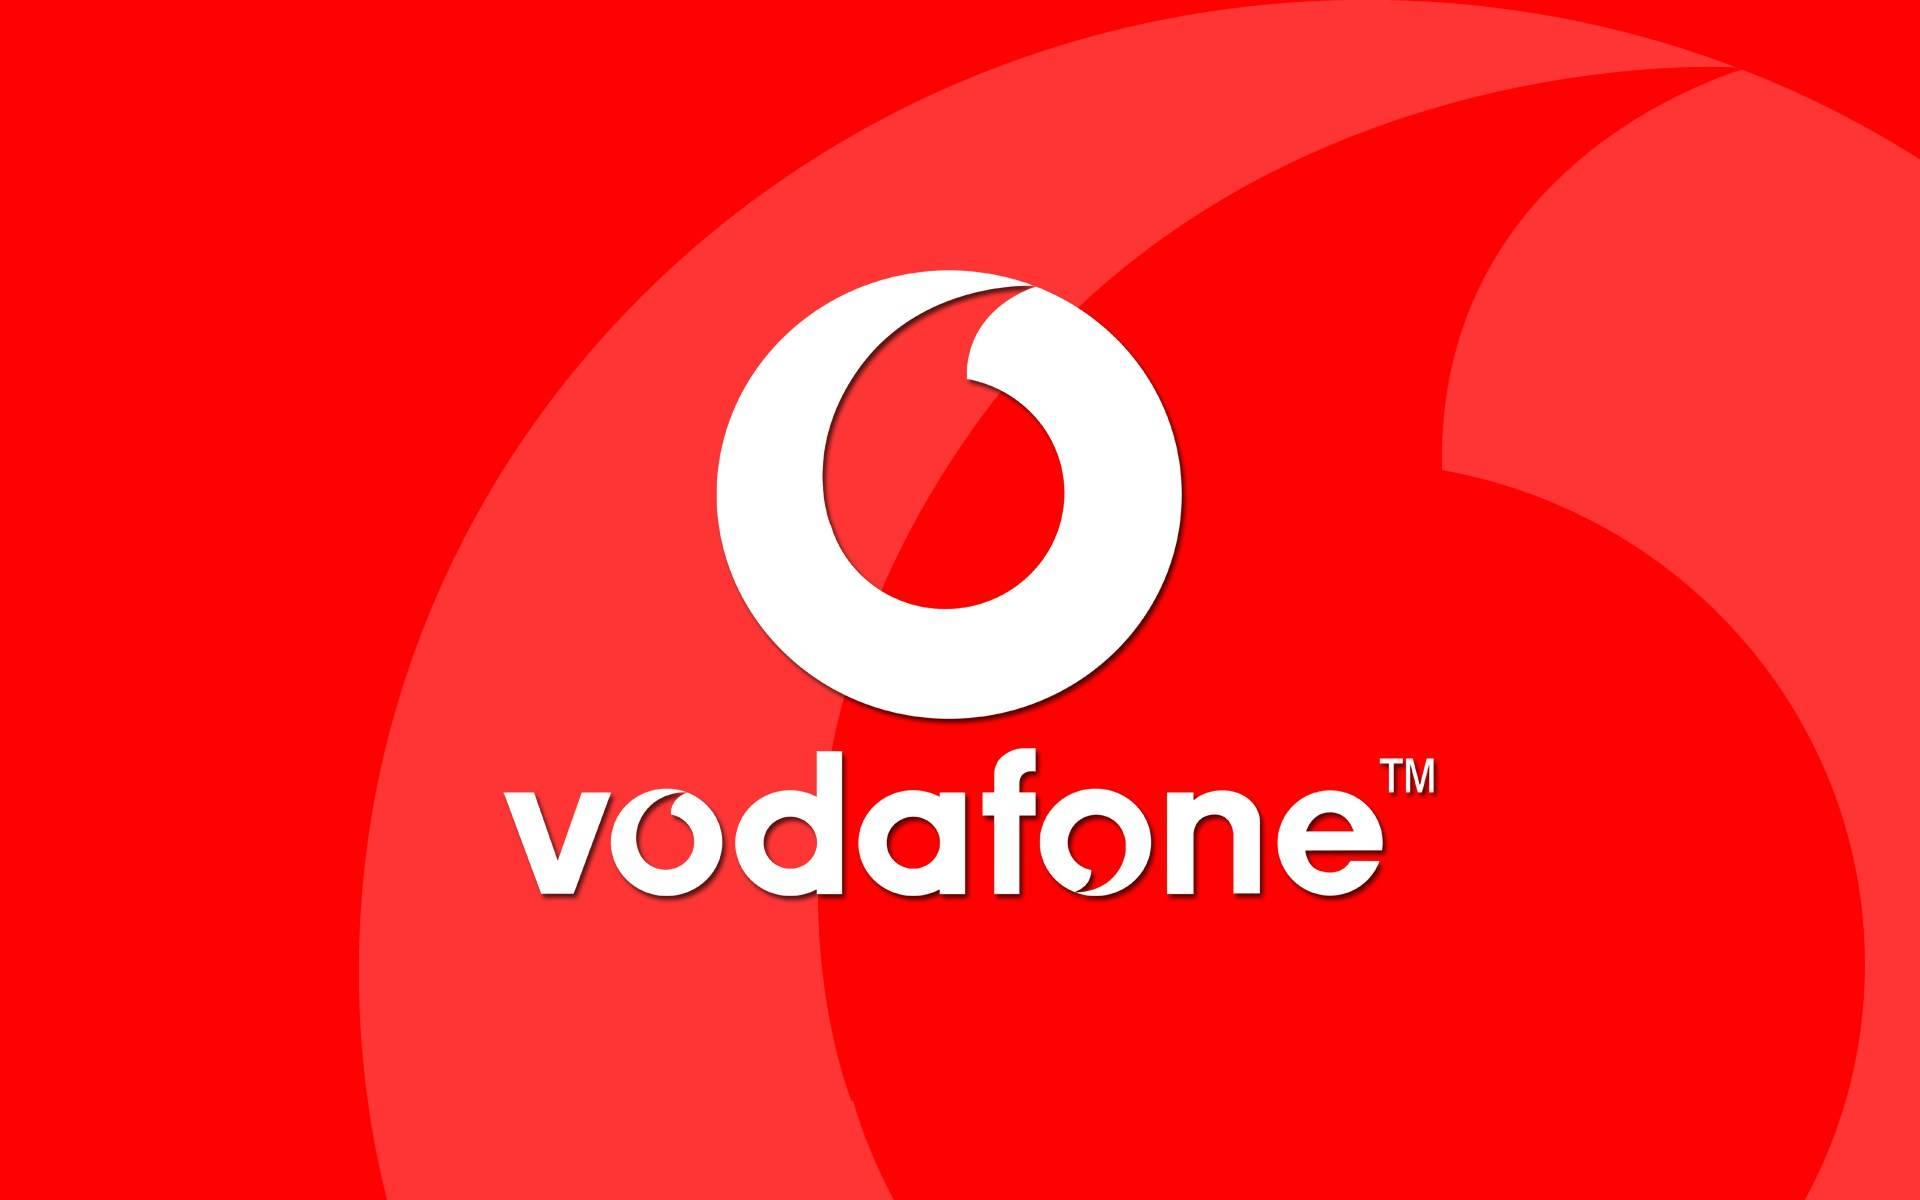 Vodafone extra4k